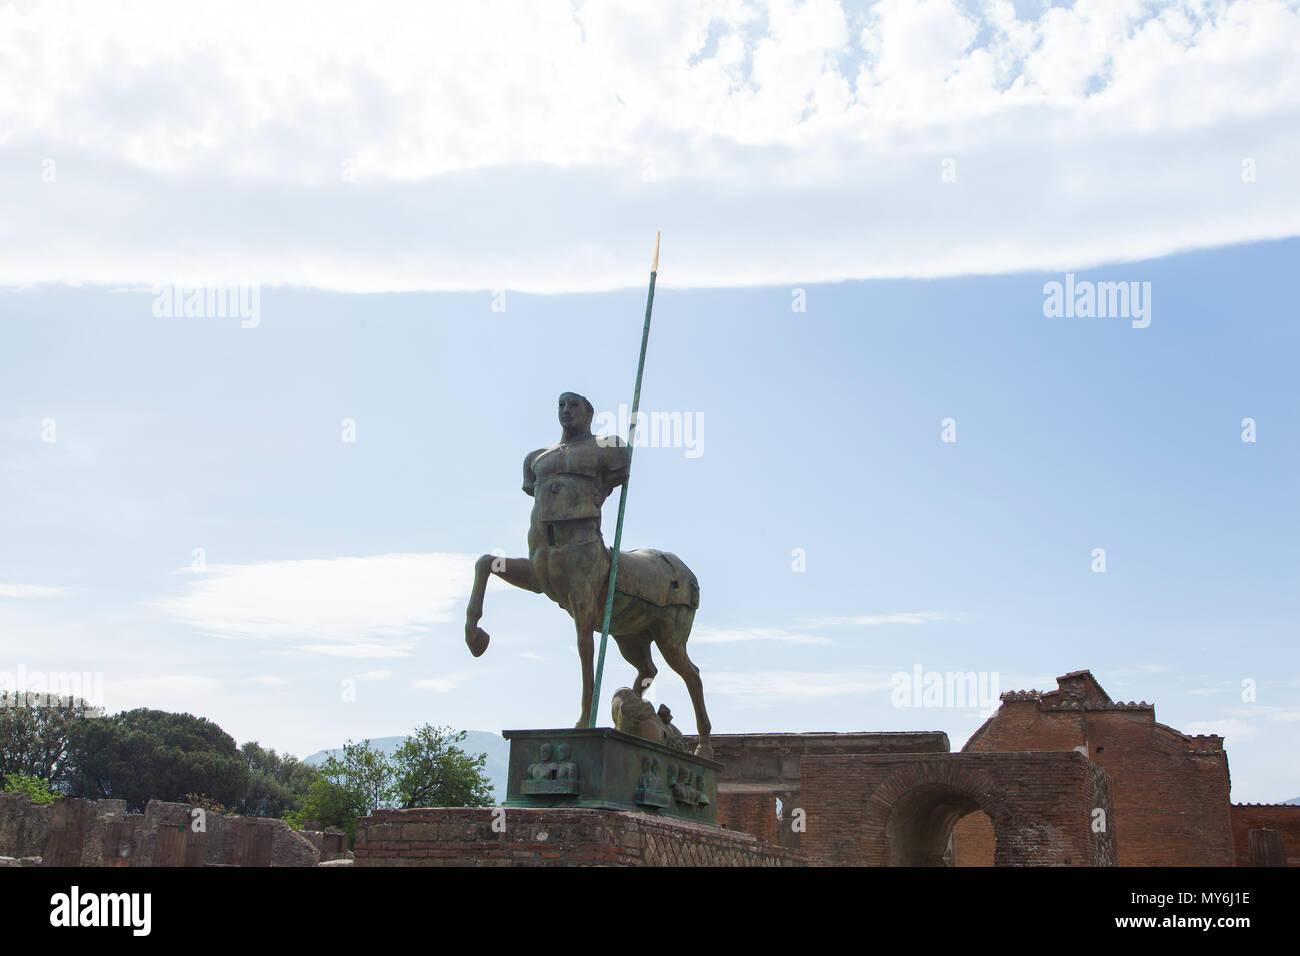 Reiterstandbild Skulptur Pompeji Ausgrabungsstätte - Stock Image